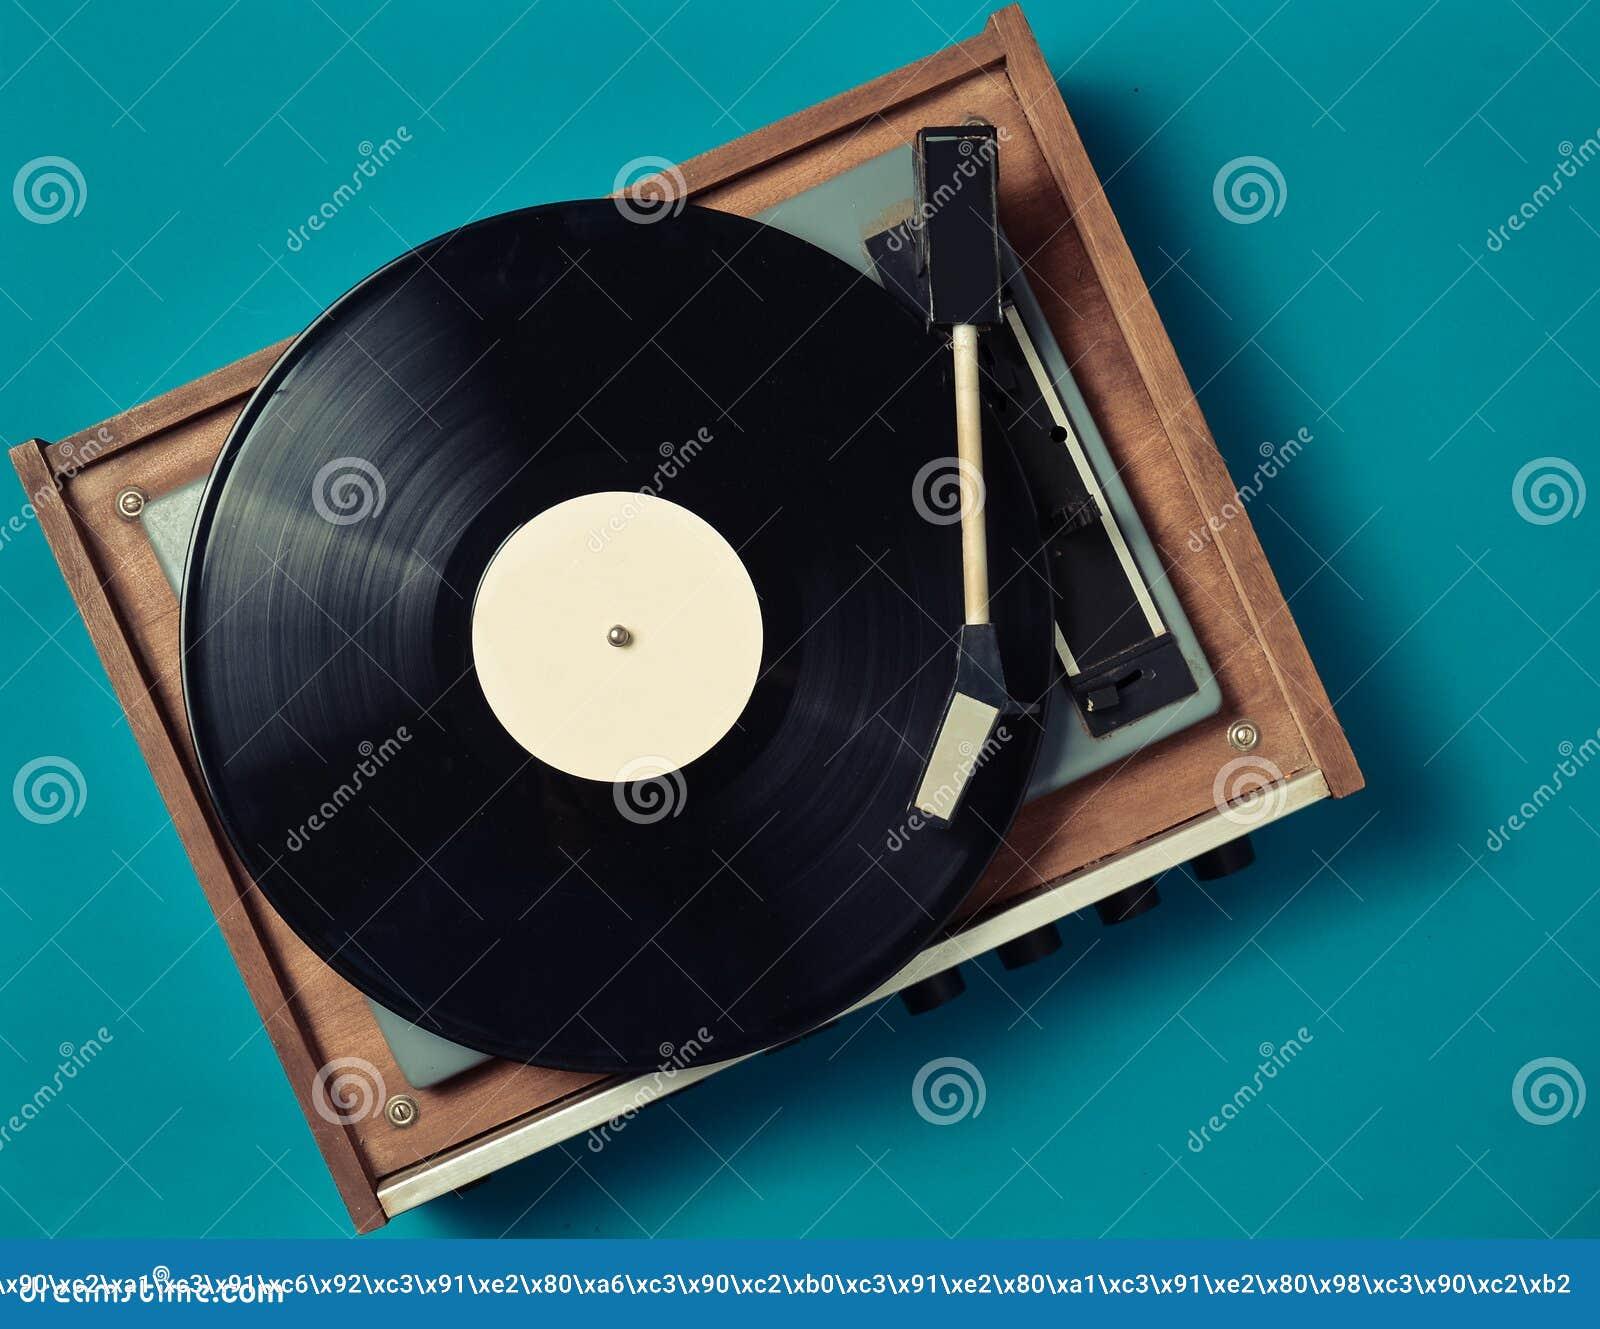 Retro vinyl player on a blue background. Entertainment 70s. Listen to music.